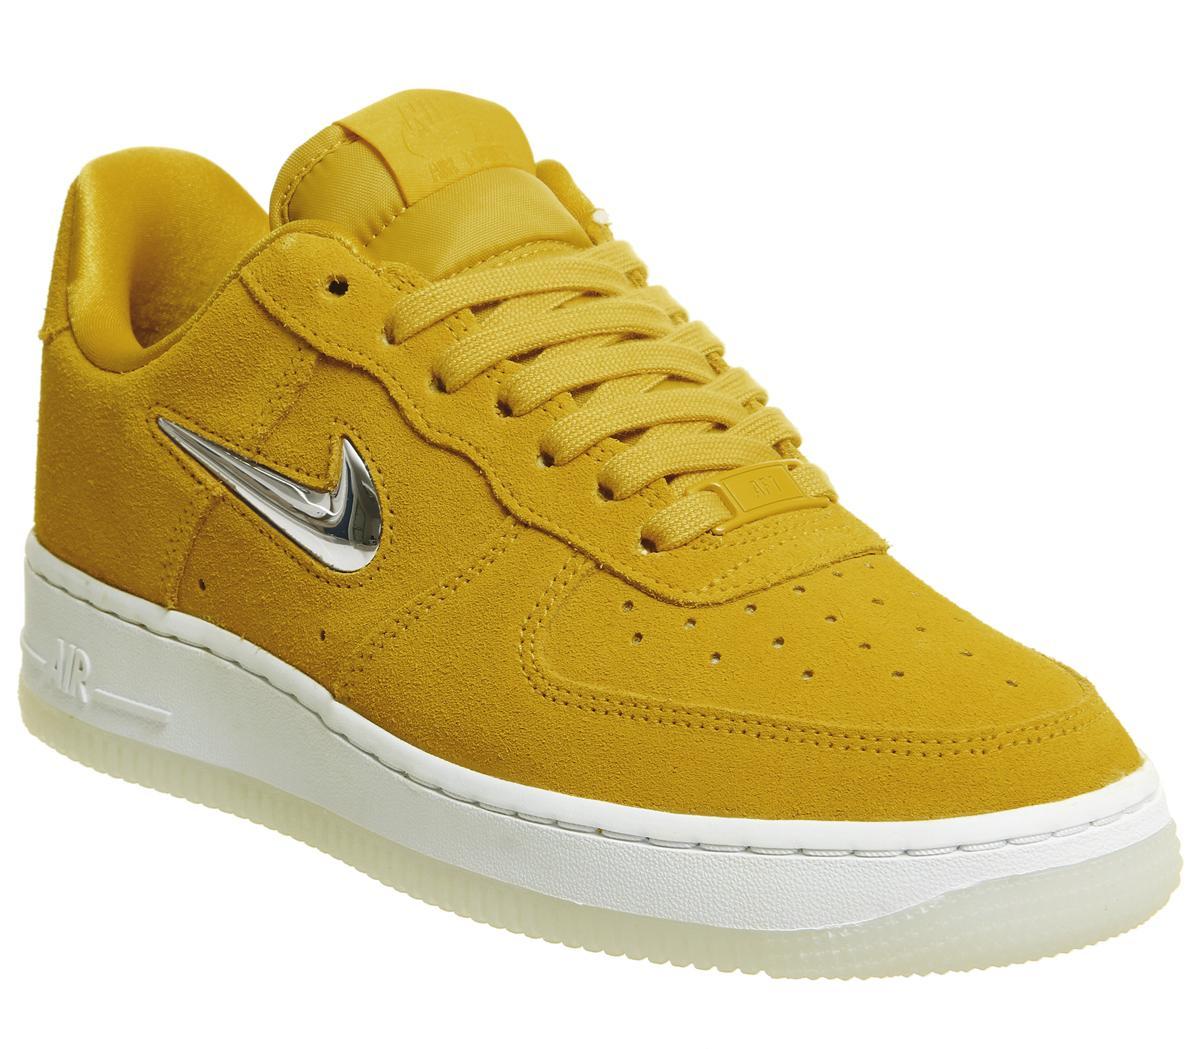 Nike Air Force 1 Jewel Trainers Yellow